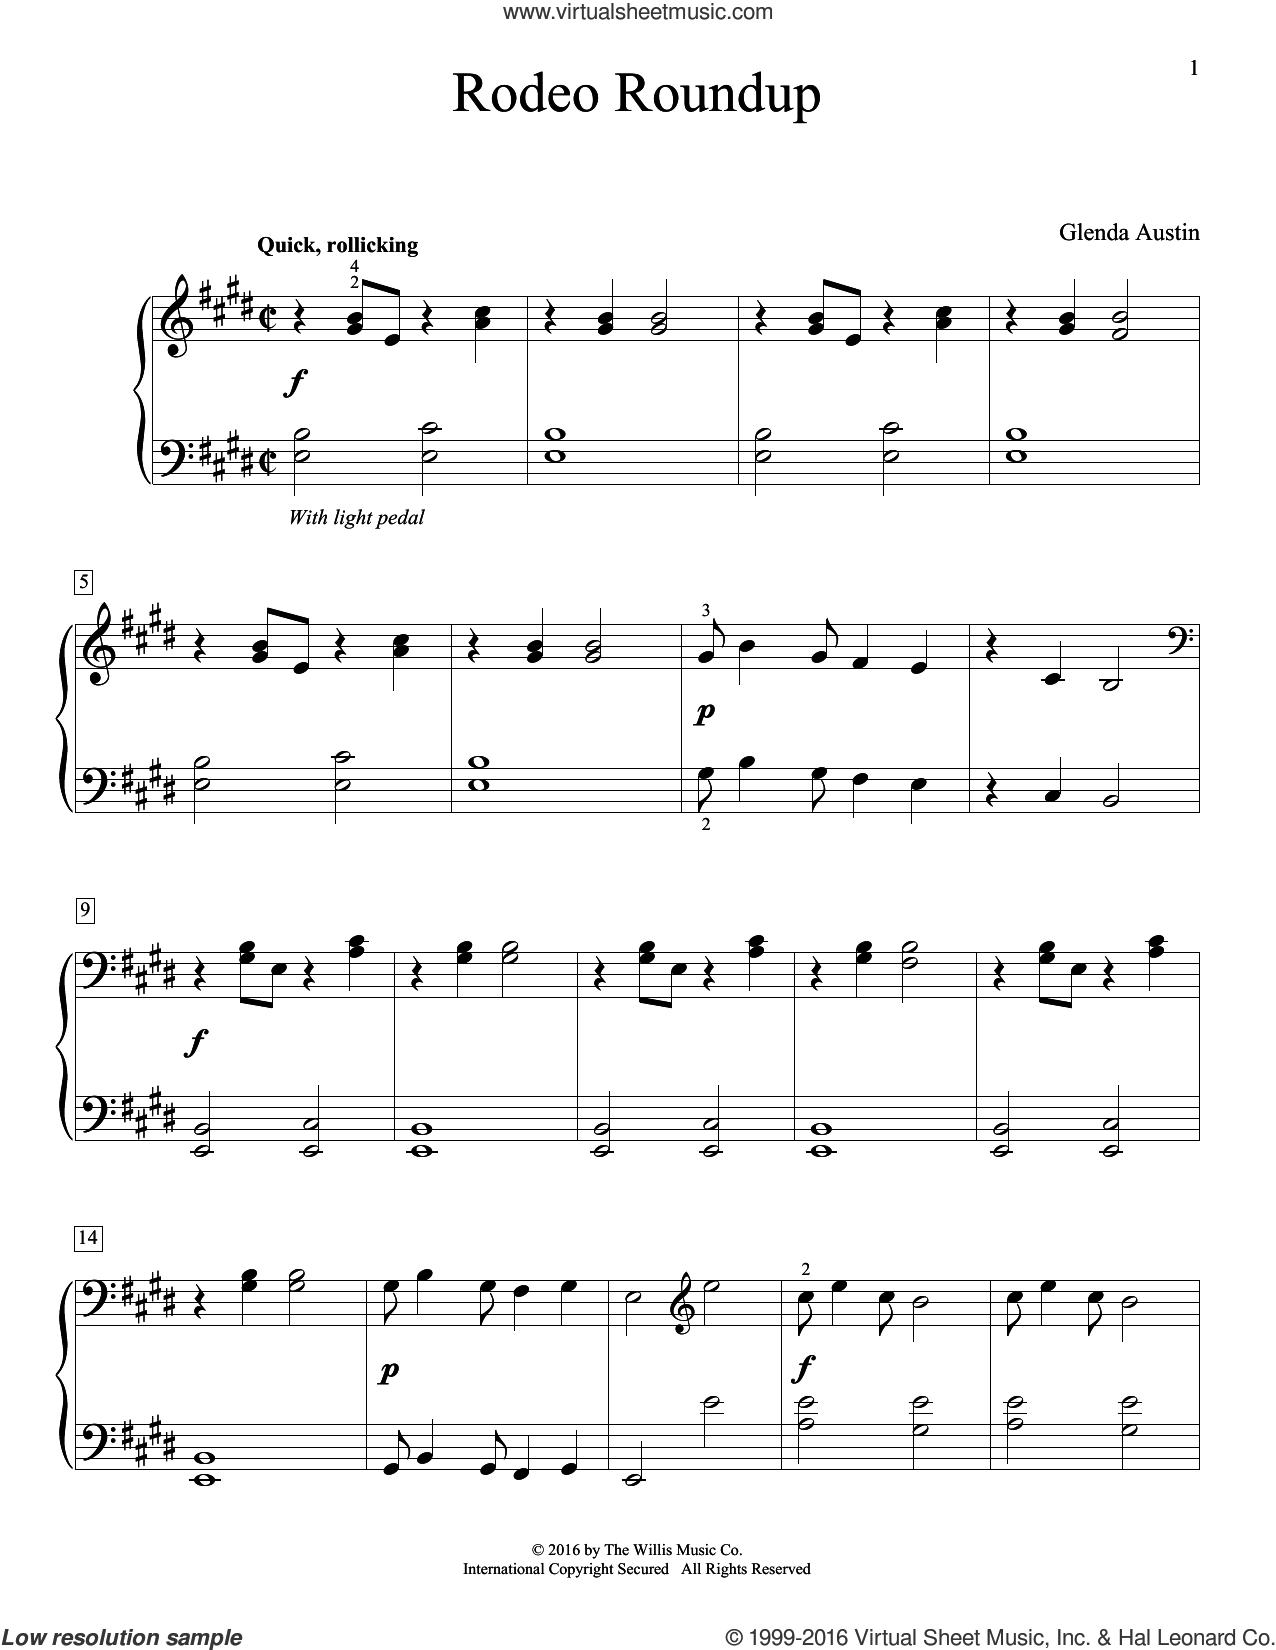 Rodeo Roundup sheet music for piano solo by Glenda Austin, intermediate skill level